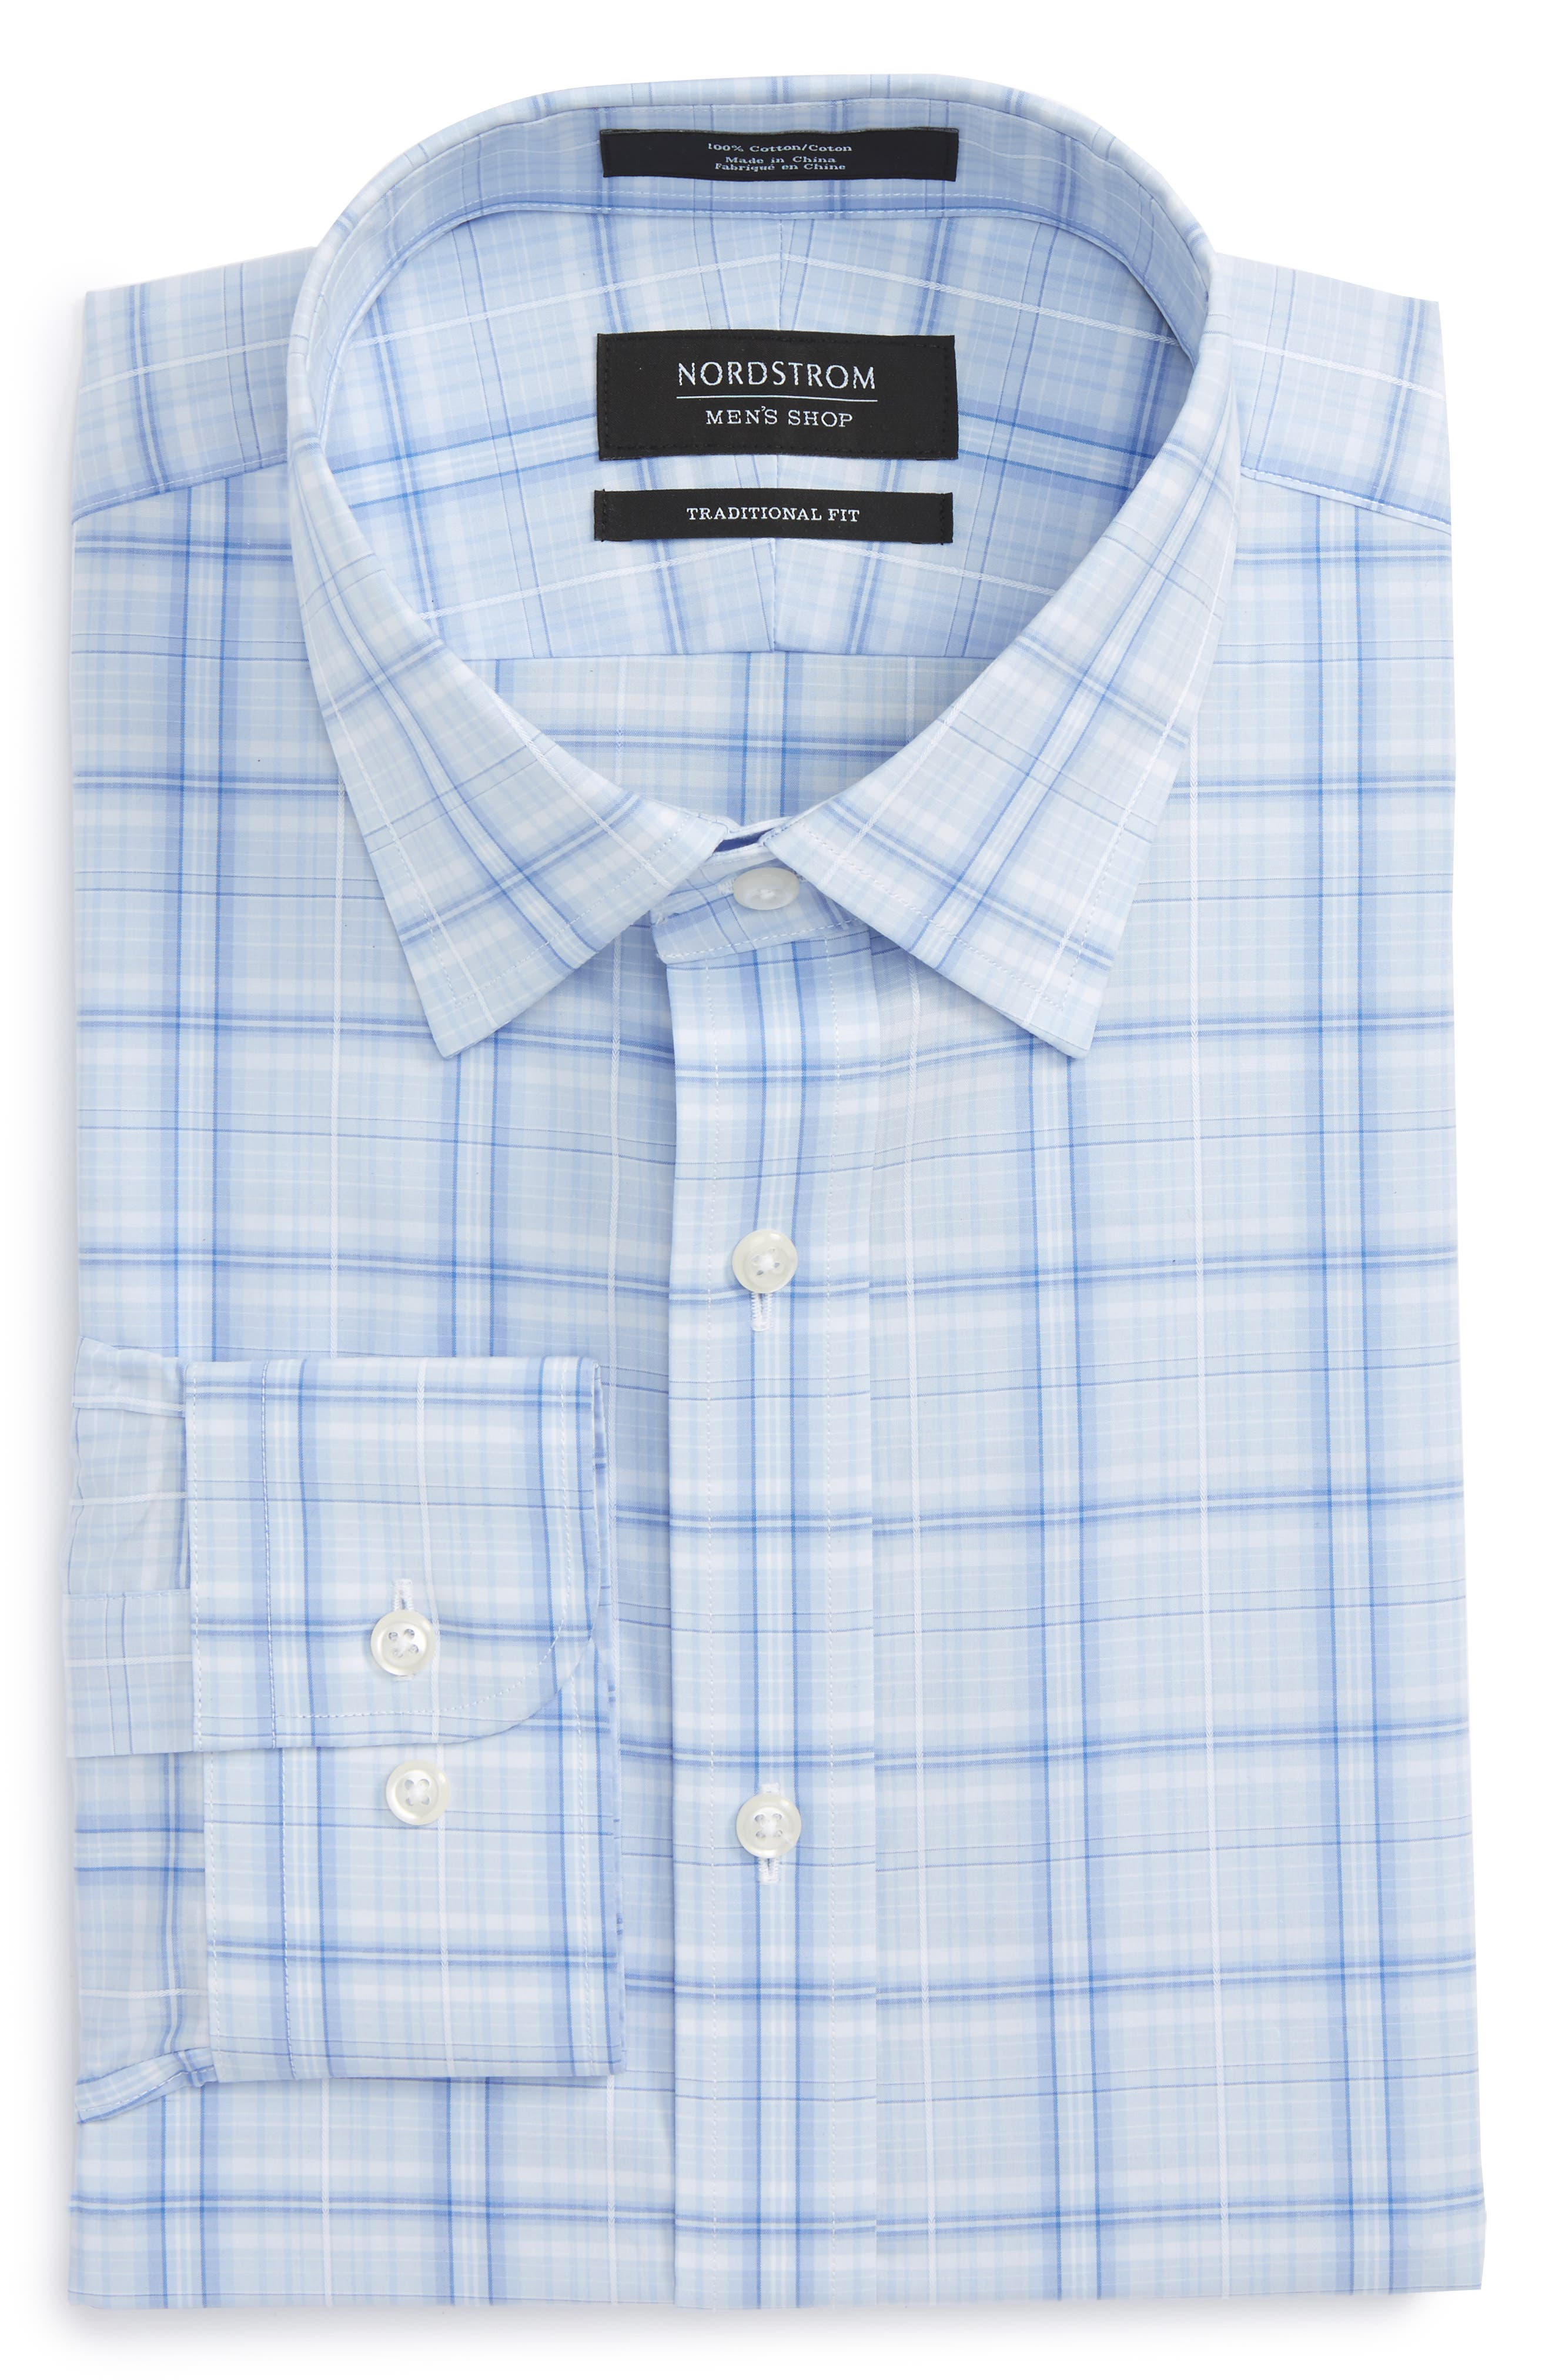 Main Image - Nordstrom Men's Shop Traditional Fit Plaid Dress Shirt